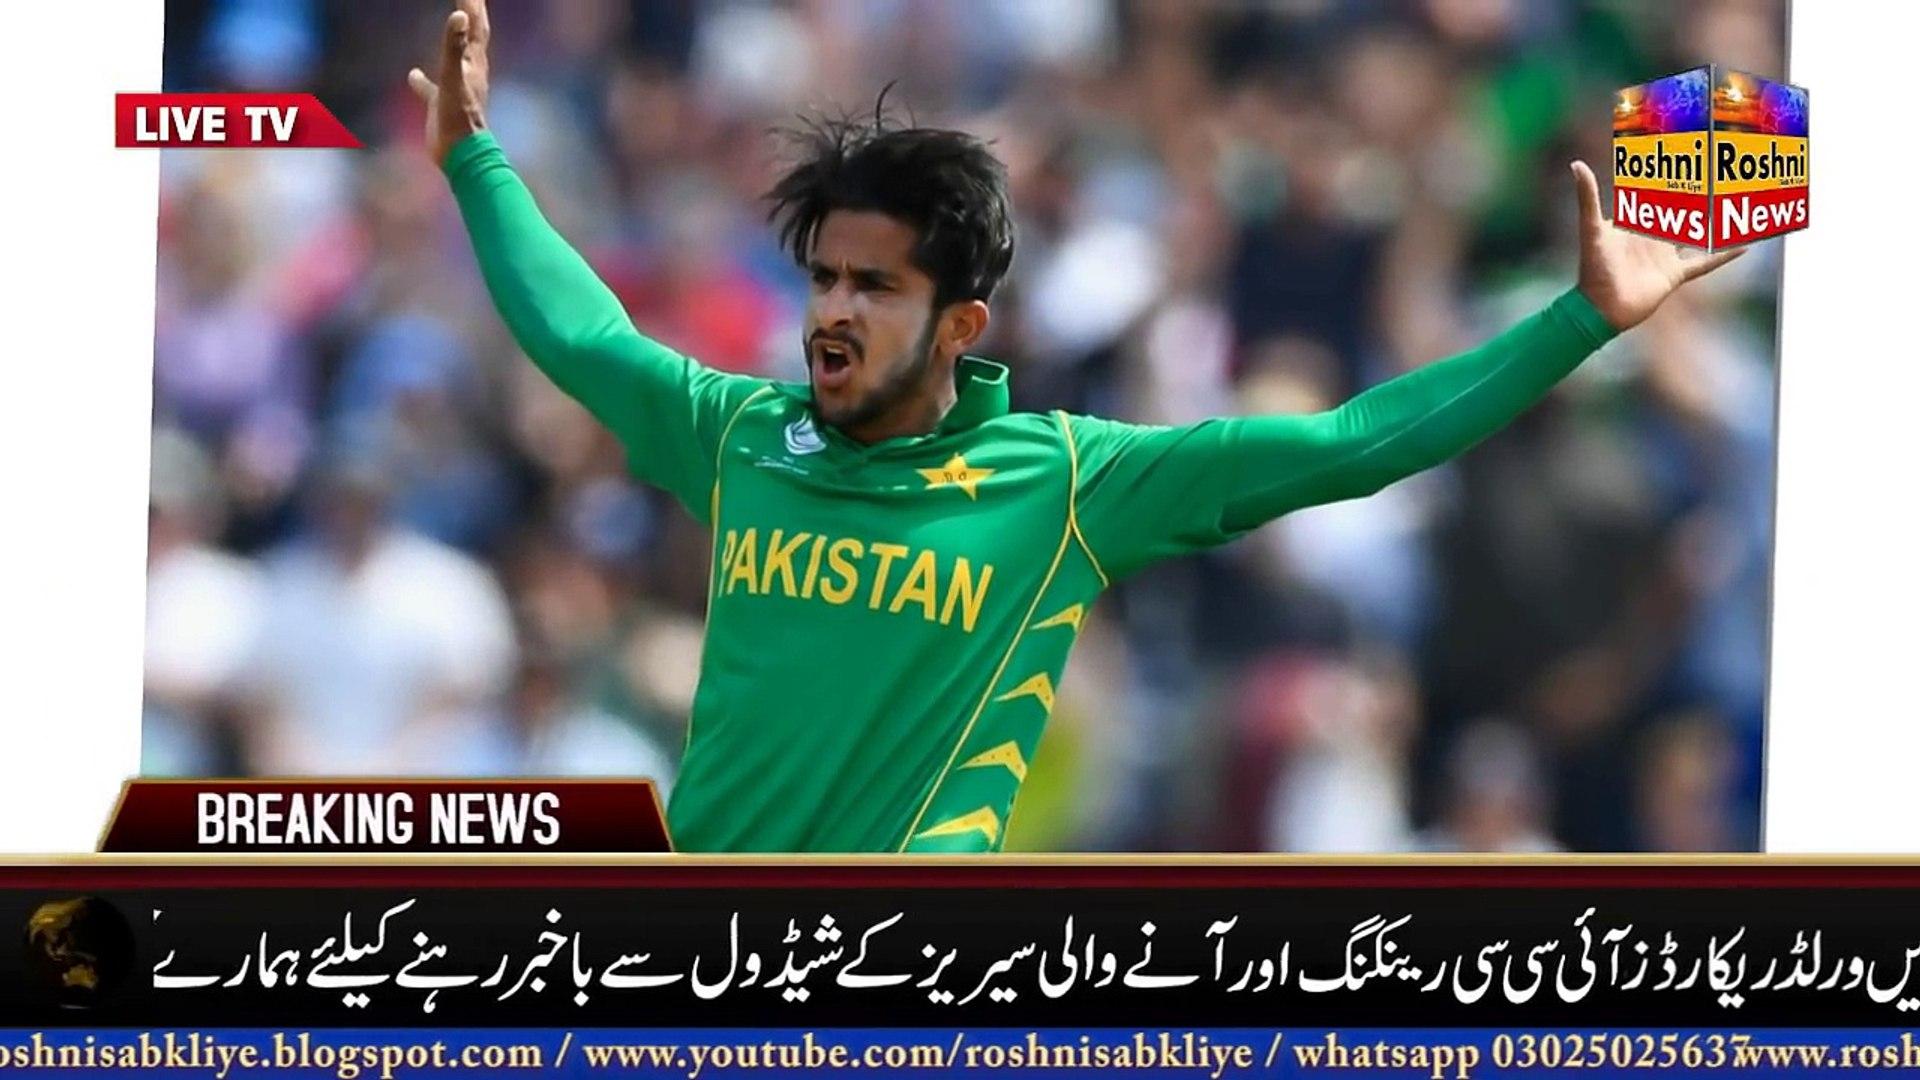 PSL 2018 Muhammad Amir VS Hasan Ali Live: | Karachi Vs Peshawar